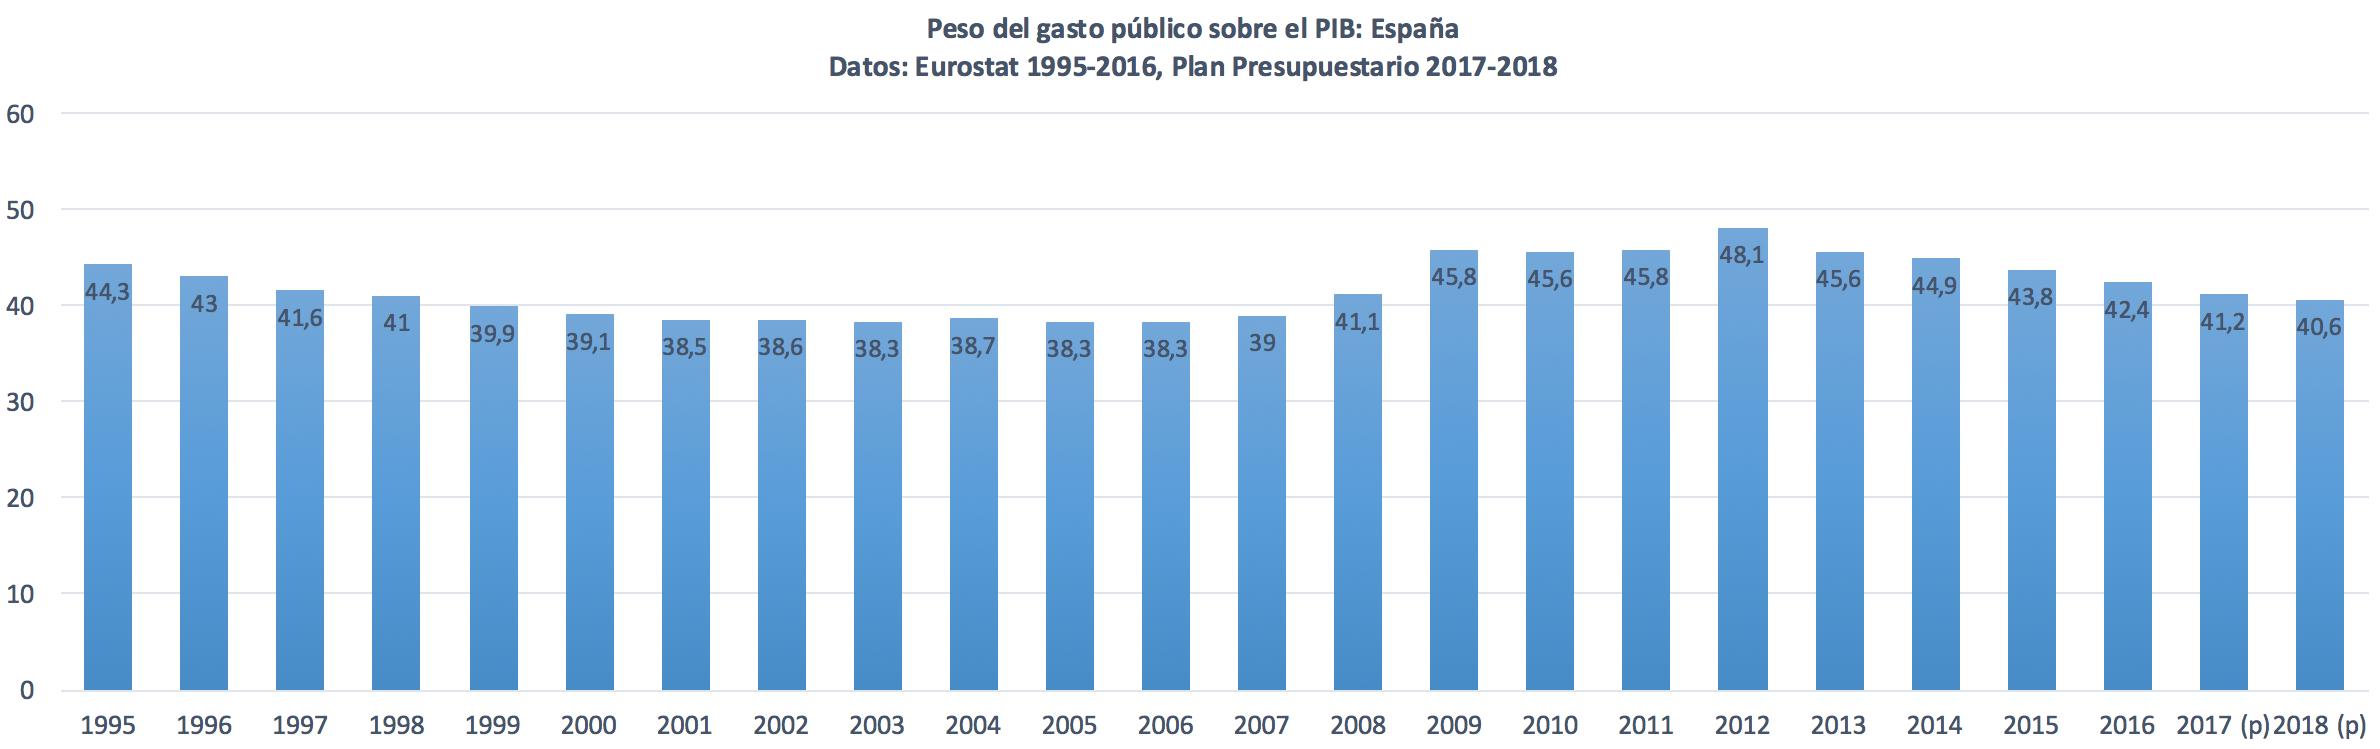 Peso-gasto-publico.png